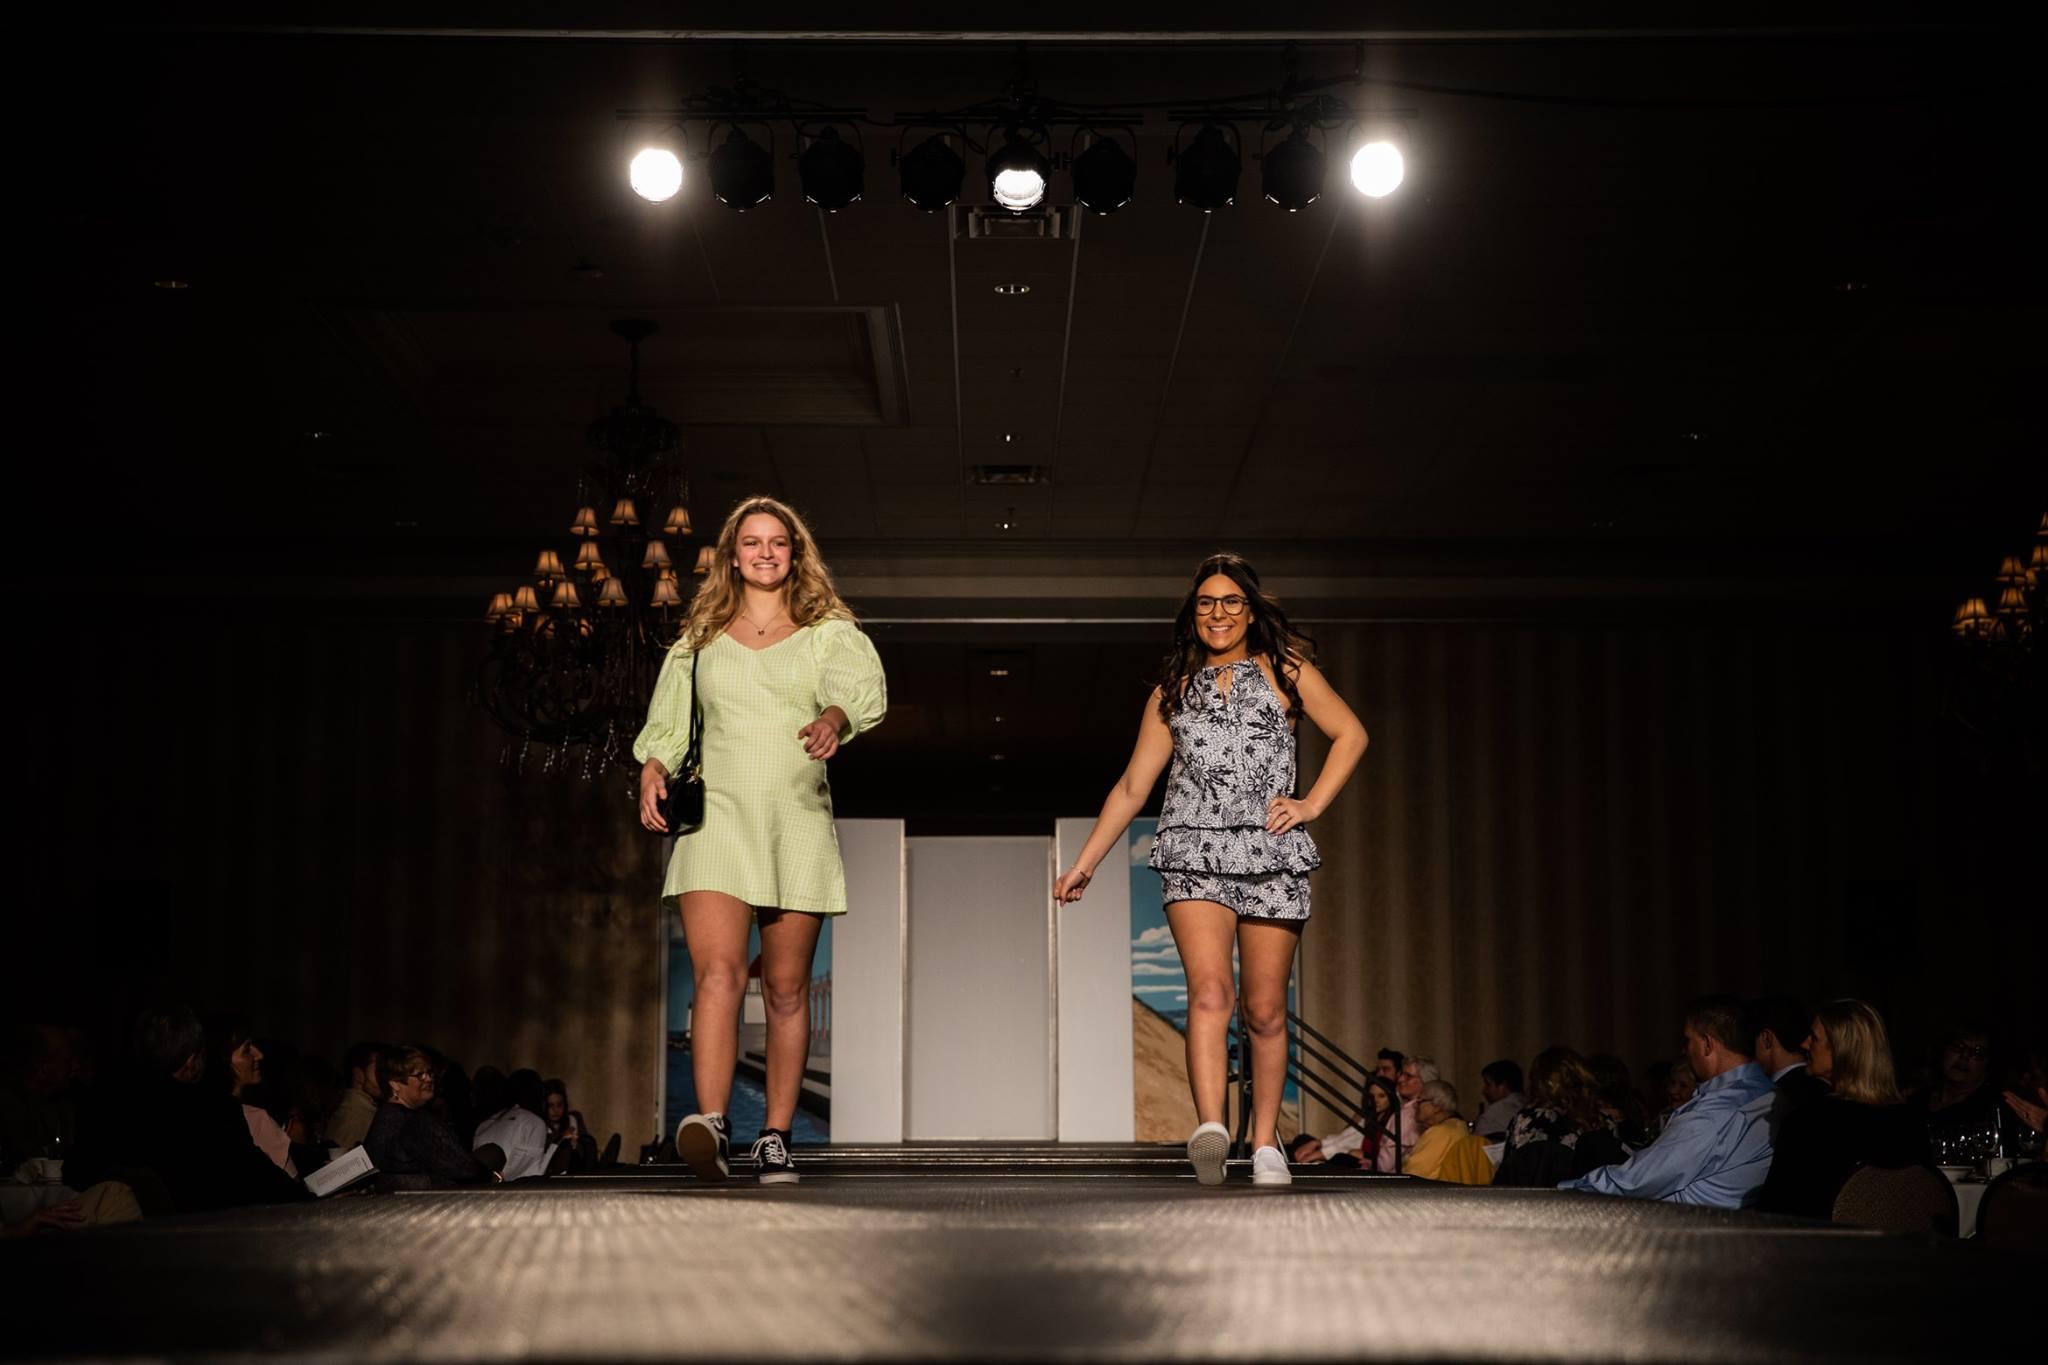 Lutheran_North_High_School_Macomb_Michigan_LHN_Fashion_Show_2019 (27).jpg